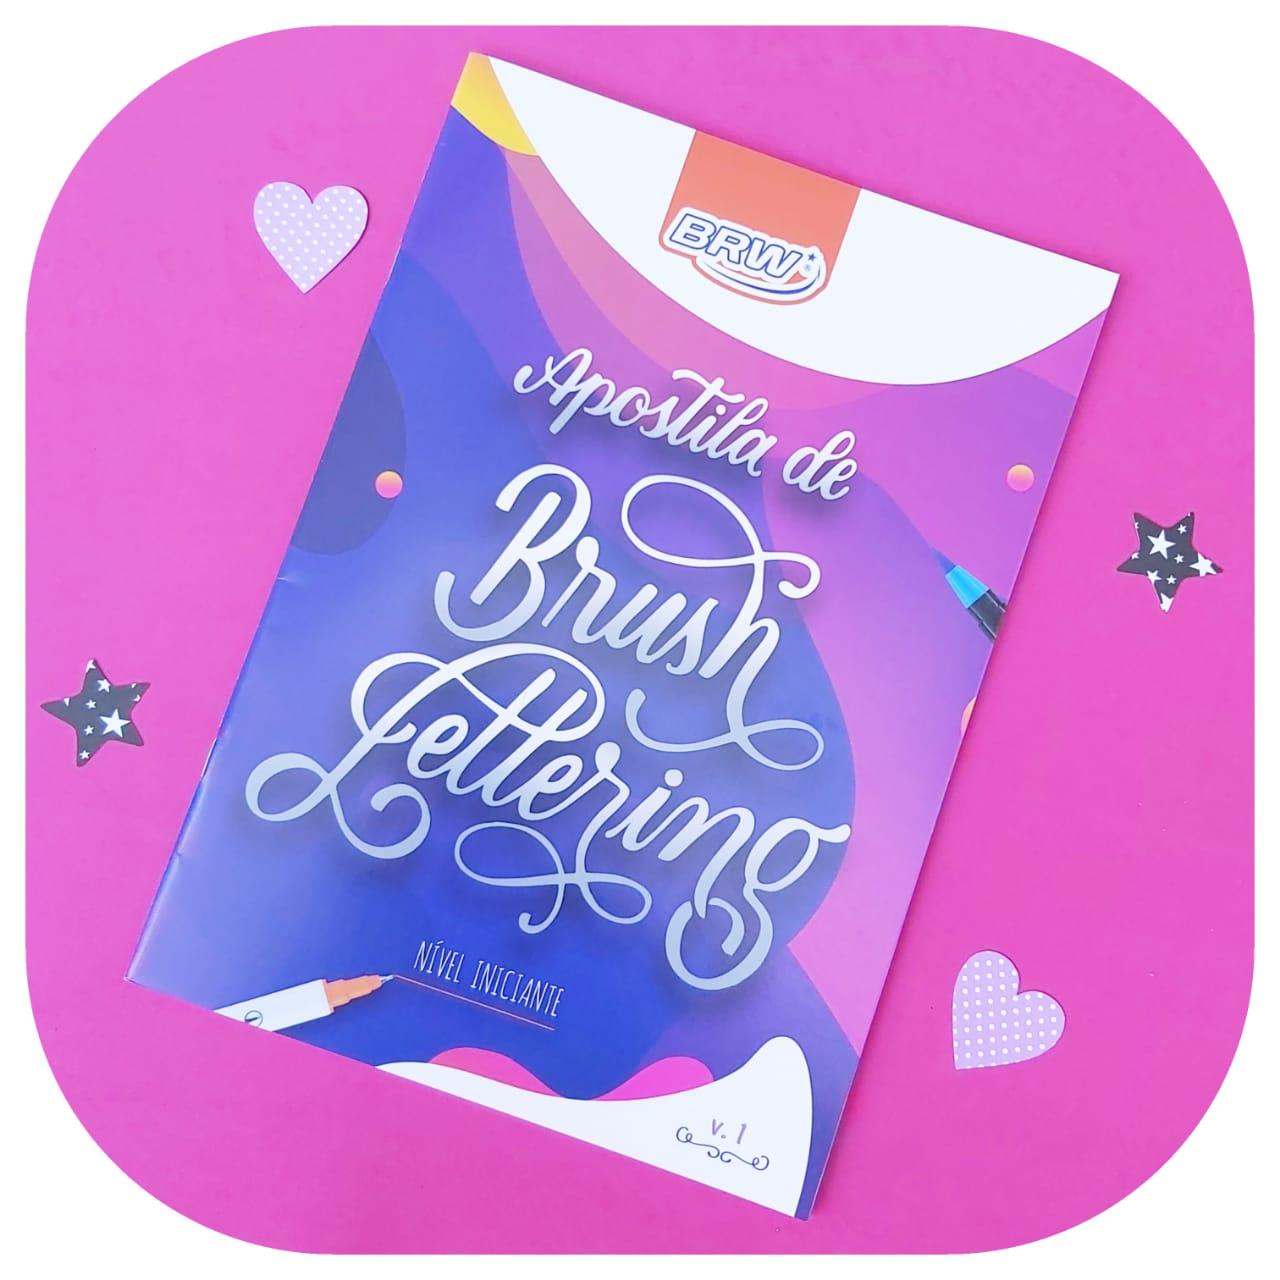 Apostila de Brush Lettering - Nível iniciante - BRW